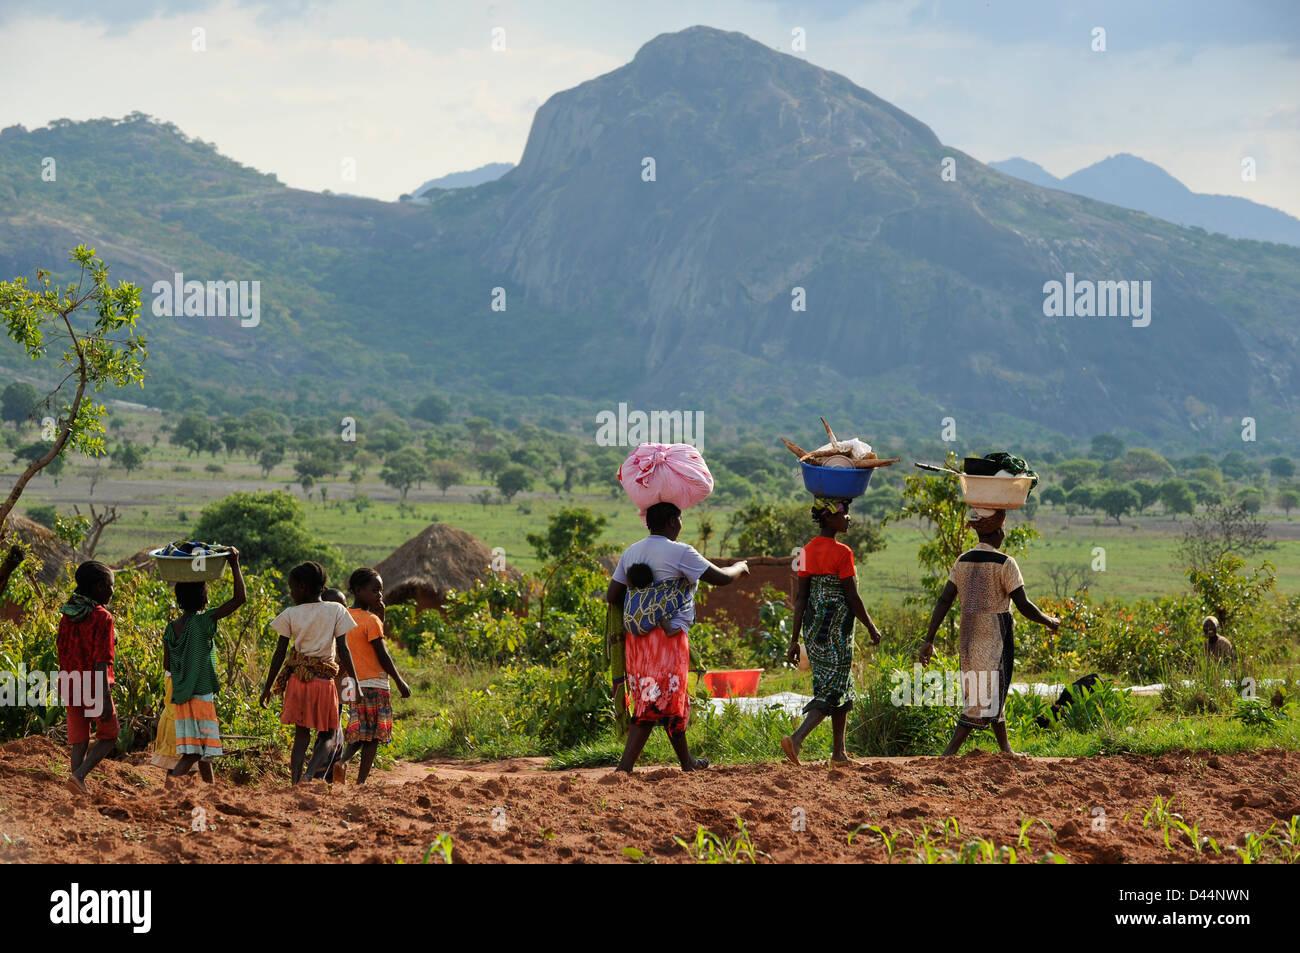 ANGOLA Kwanza Sul, rural development project, village Catchandja, women and children walk home - Stock Image